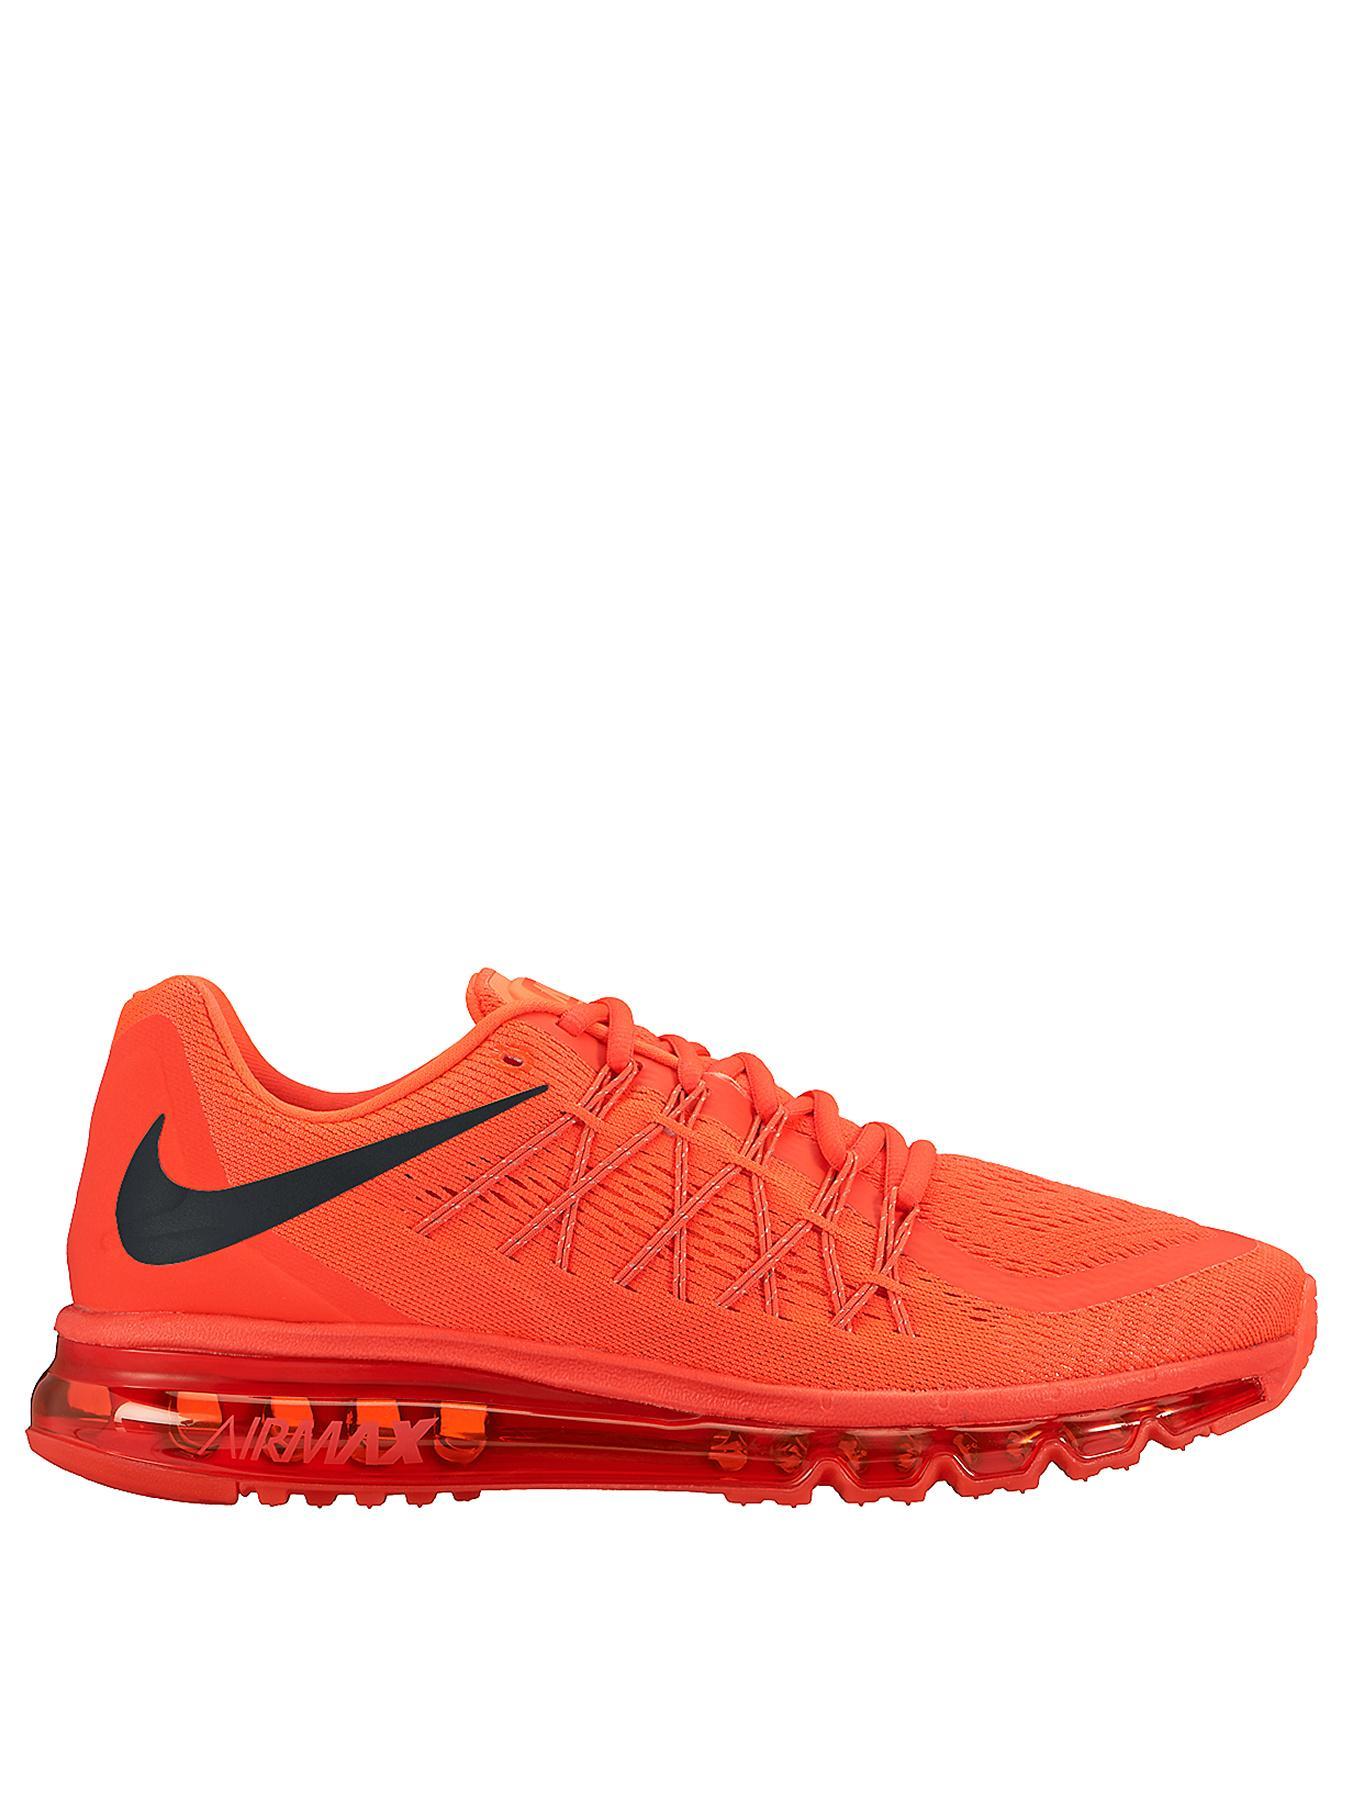 Nike Air Max 2015 Anniversary Pack